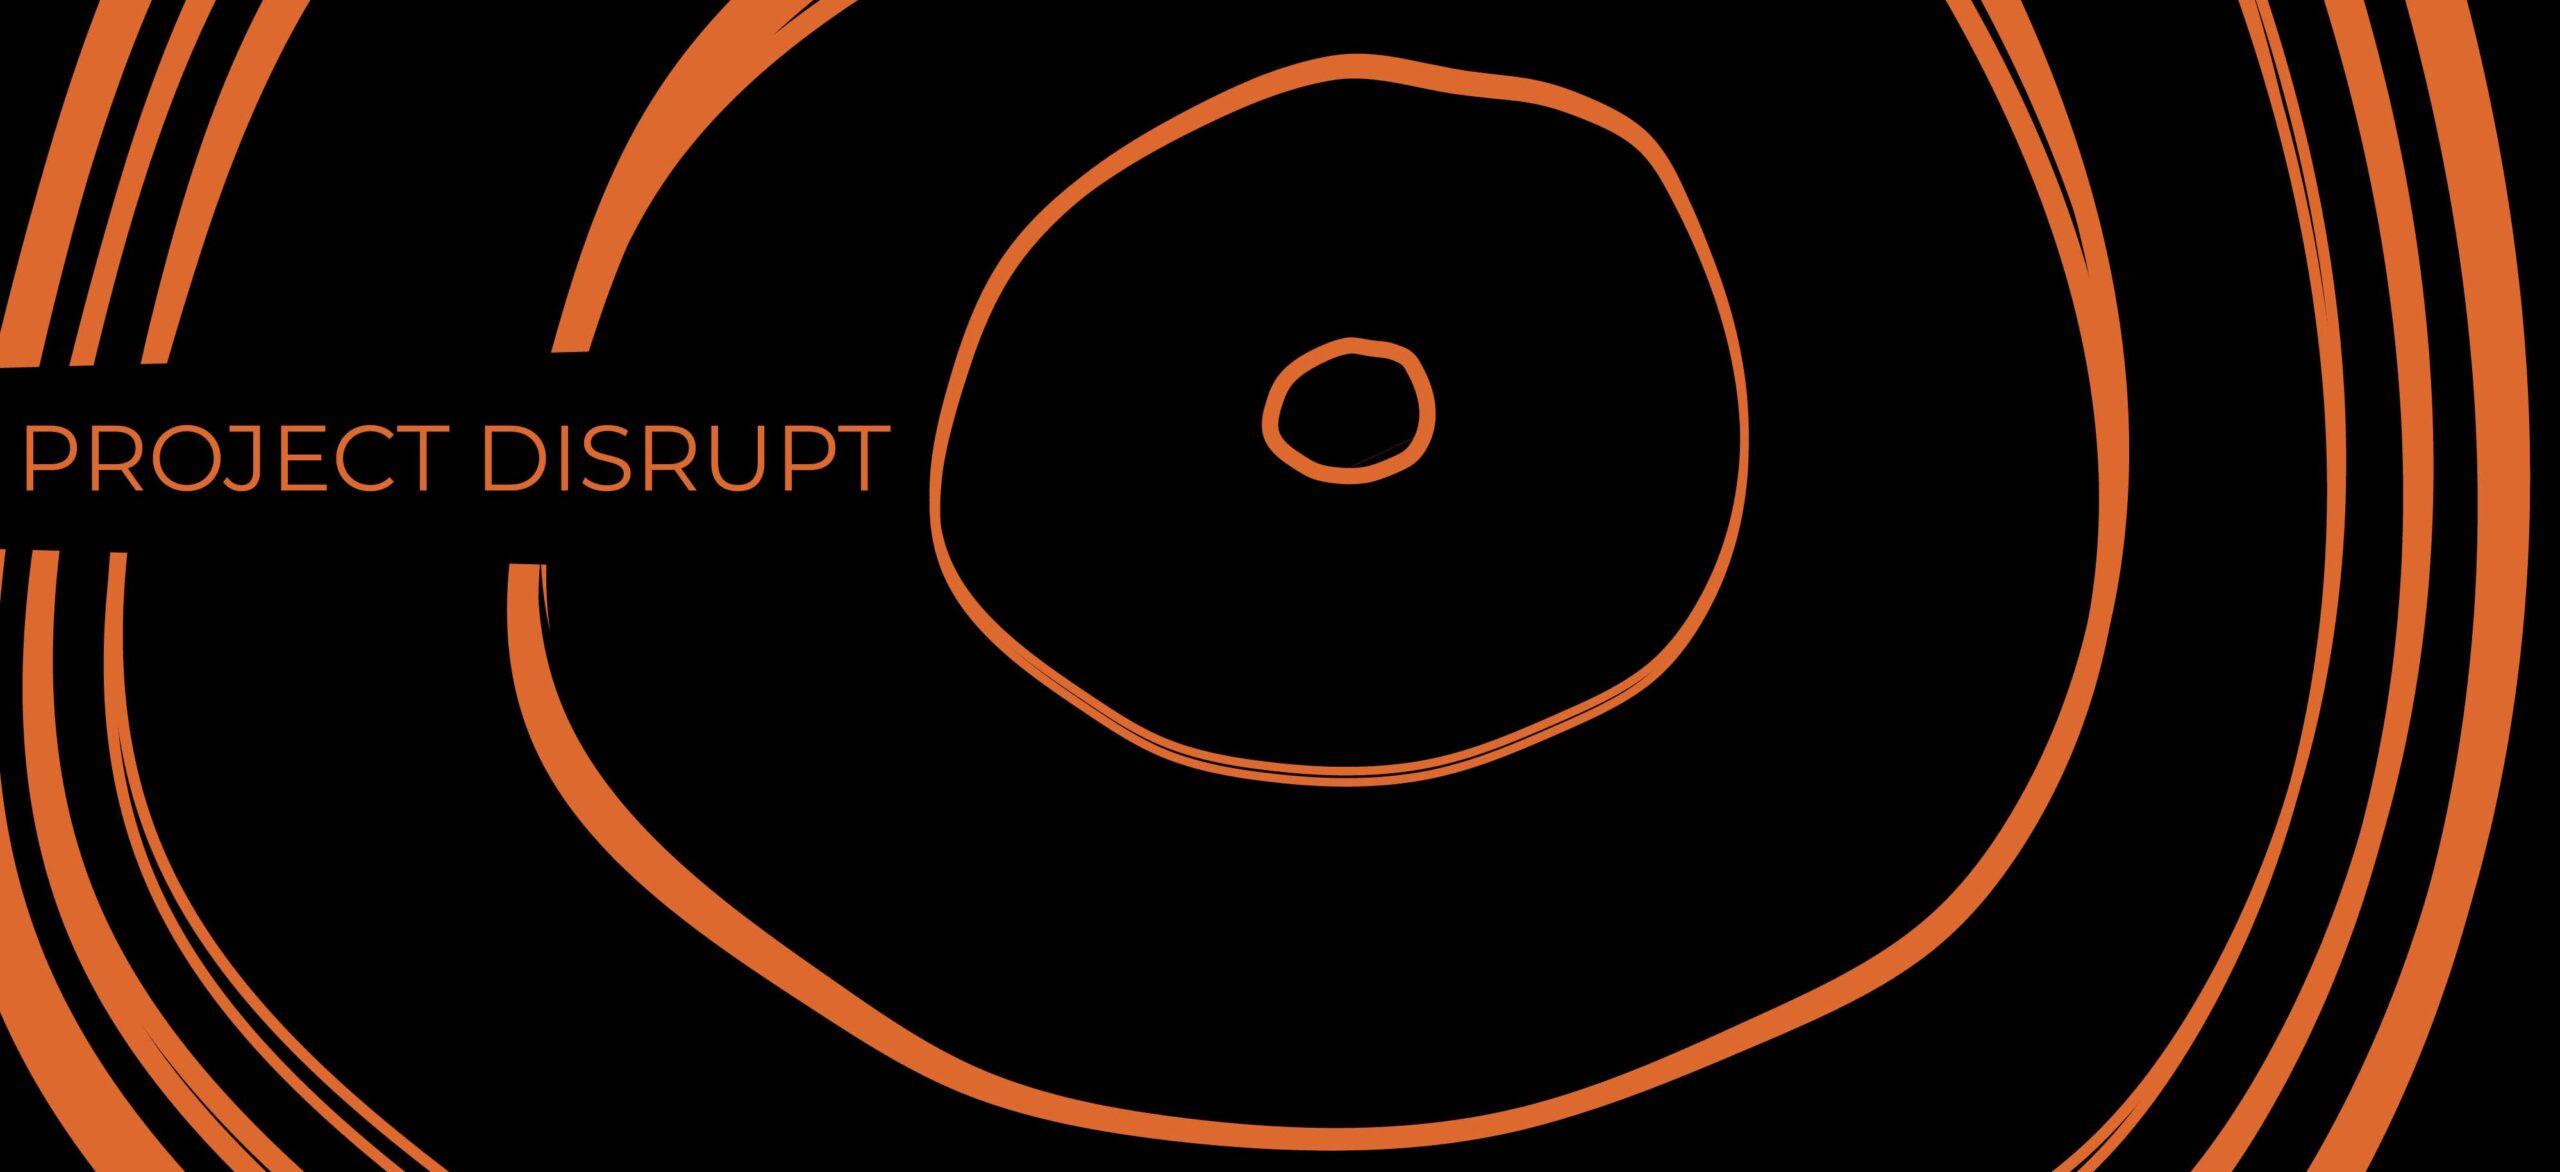 Project Disrupt